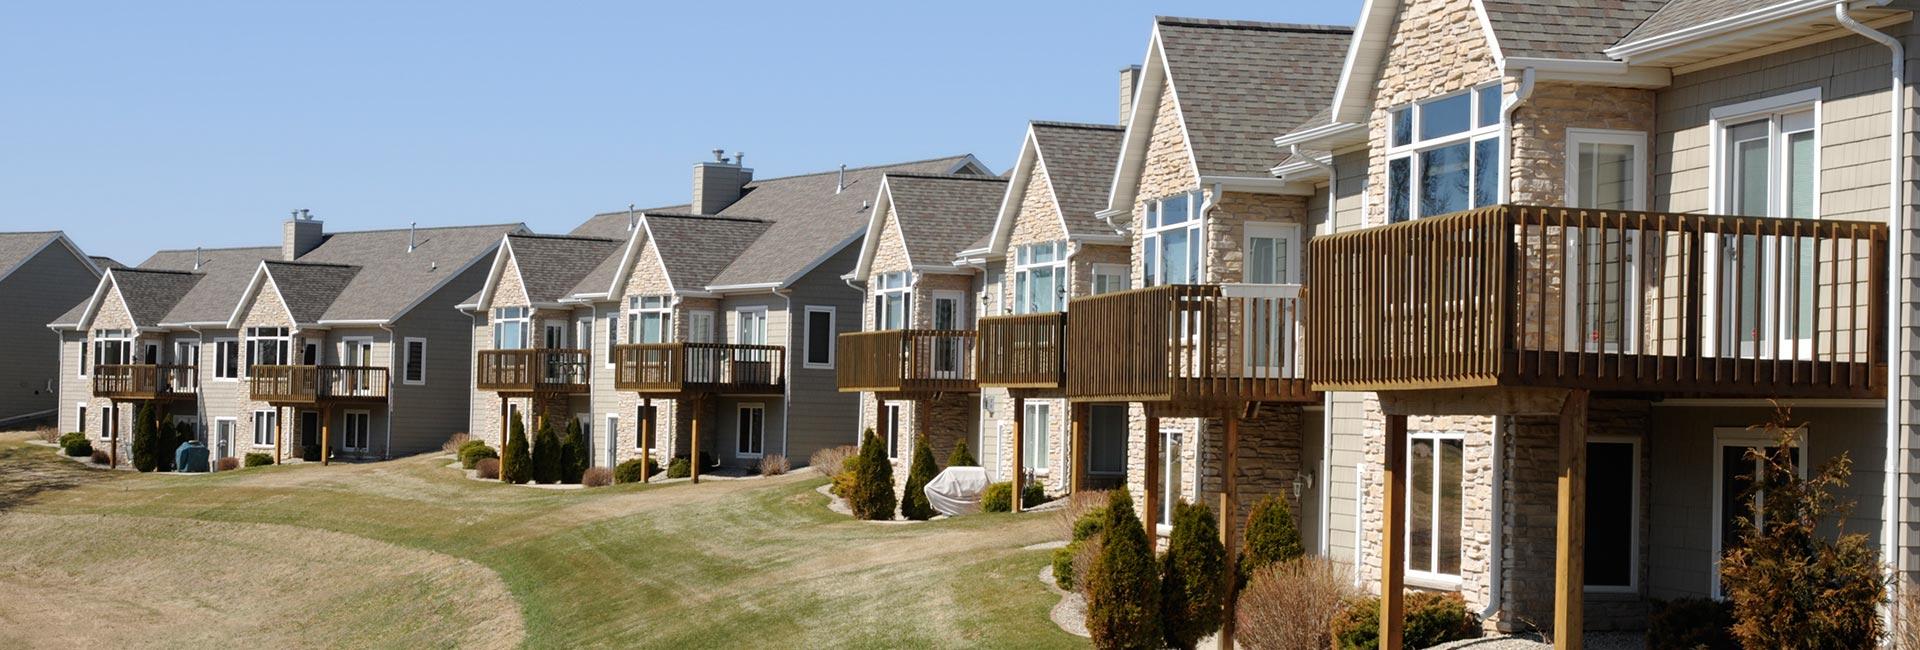 Premier Home Renovations - Hamilton Roofing Contractor - Bethlehem Roofing Contractor